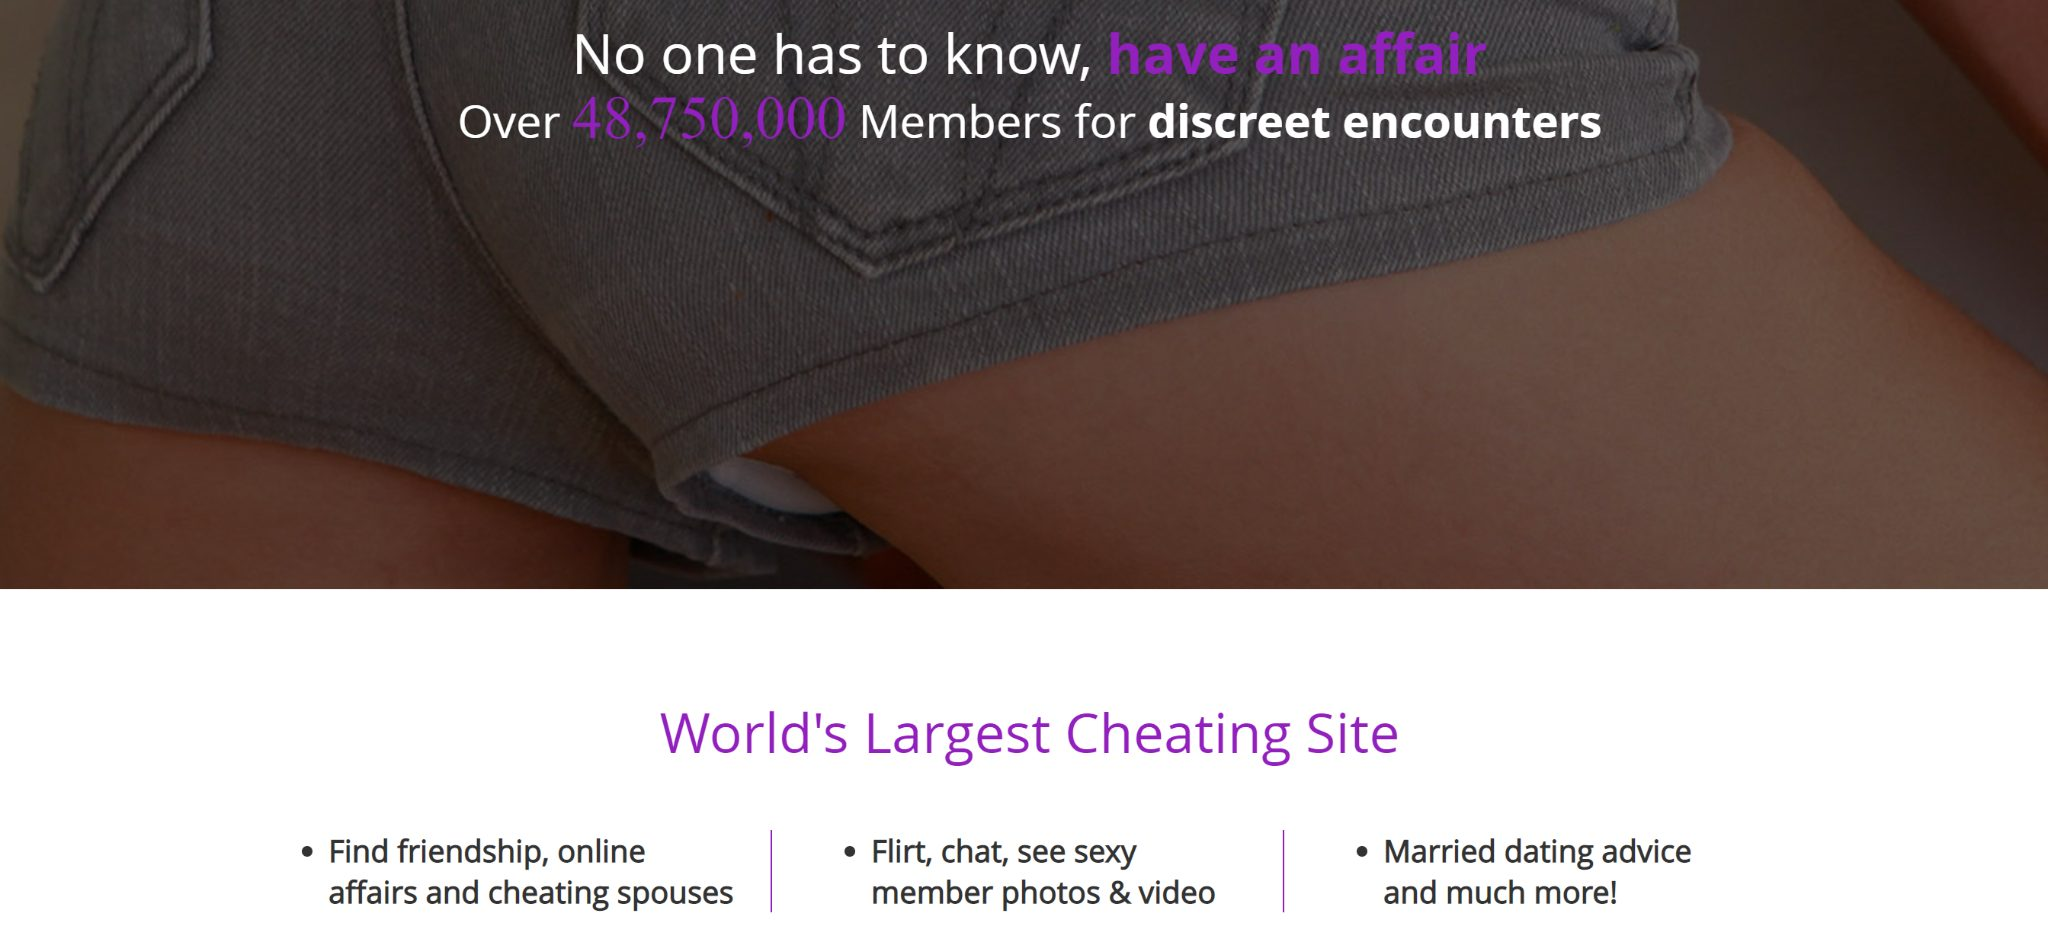 Over 40 million members worldwide